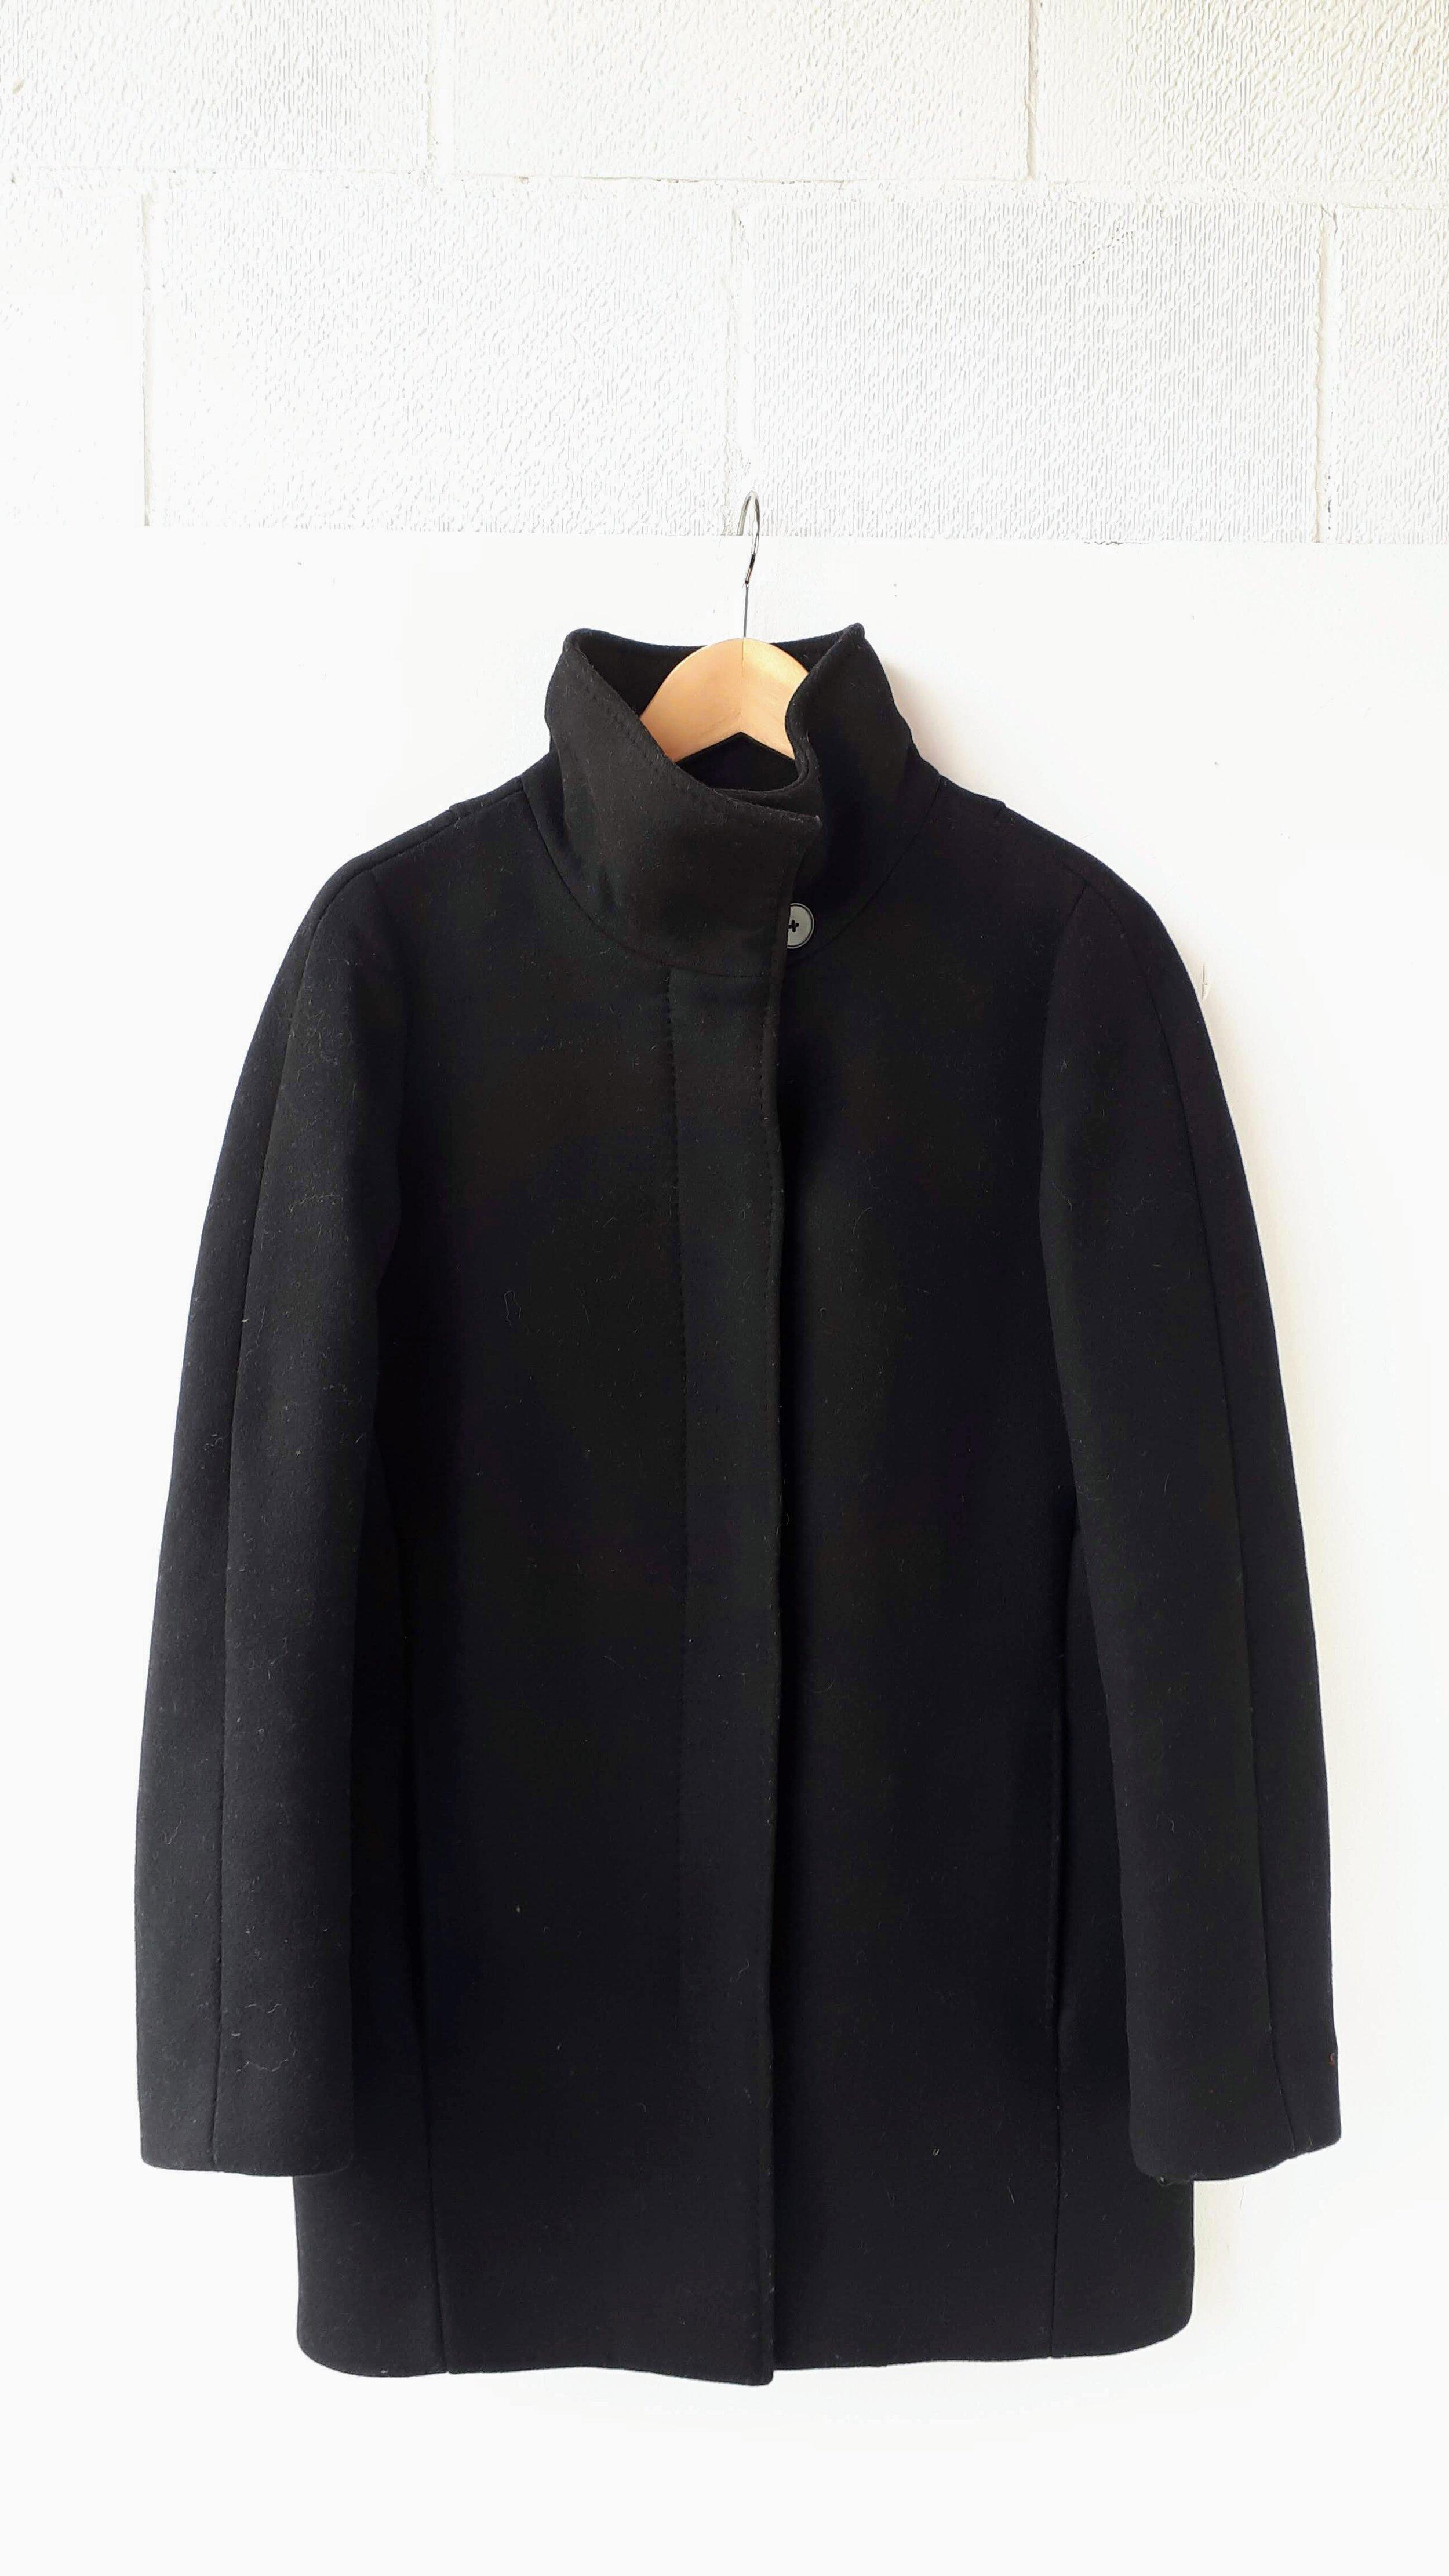 Babaton coat; Size S, $65